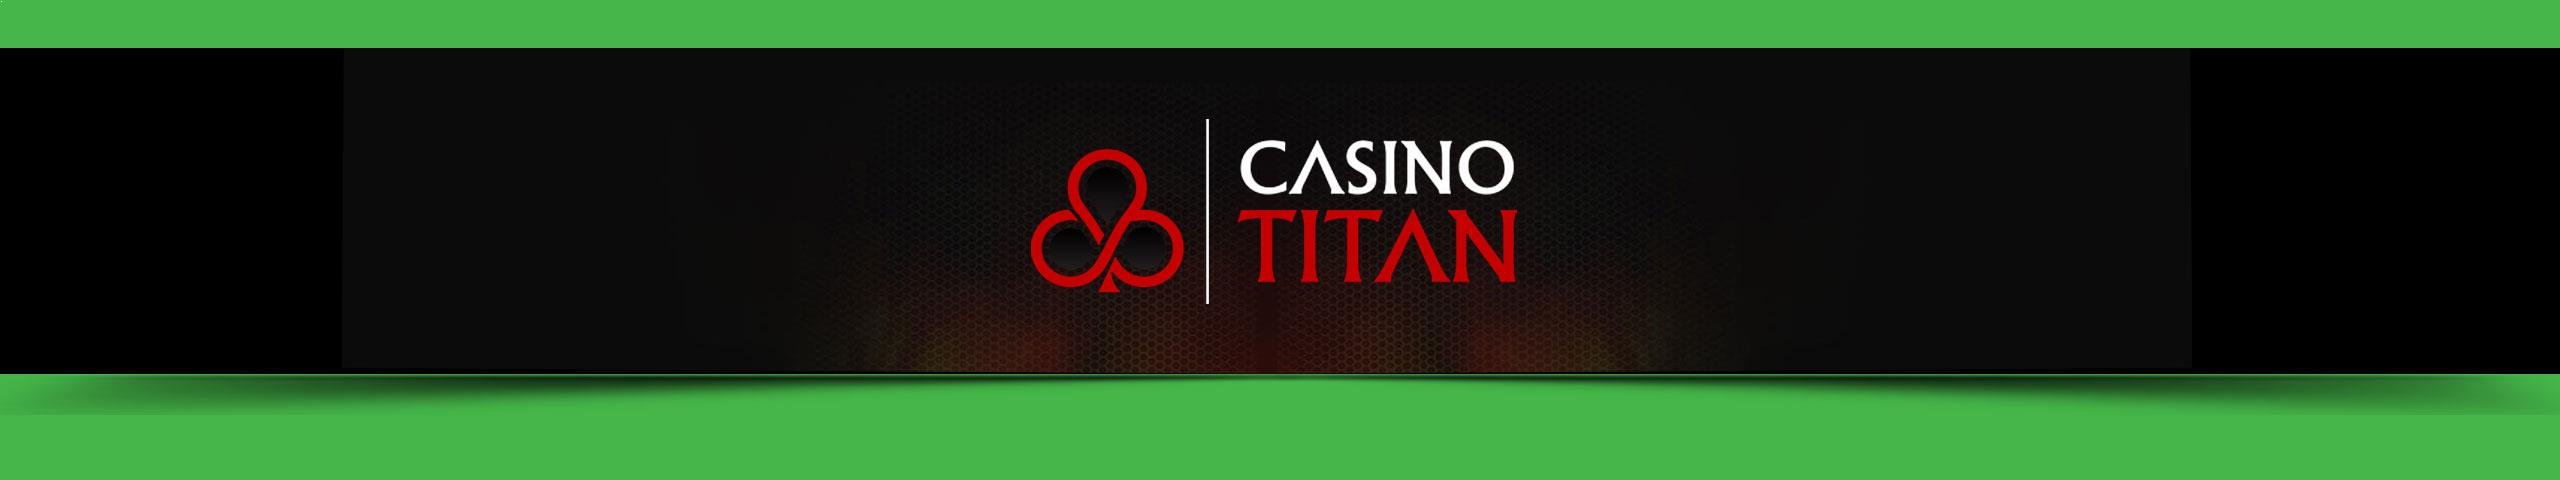 TitanCasino Vizualizarea Casino-ului Multa Bafta Slider